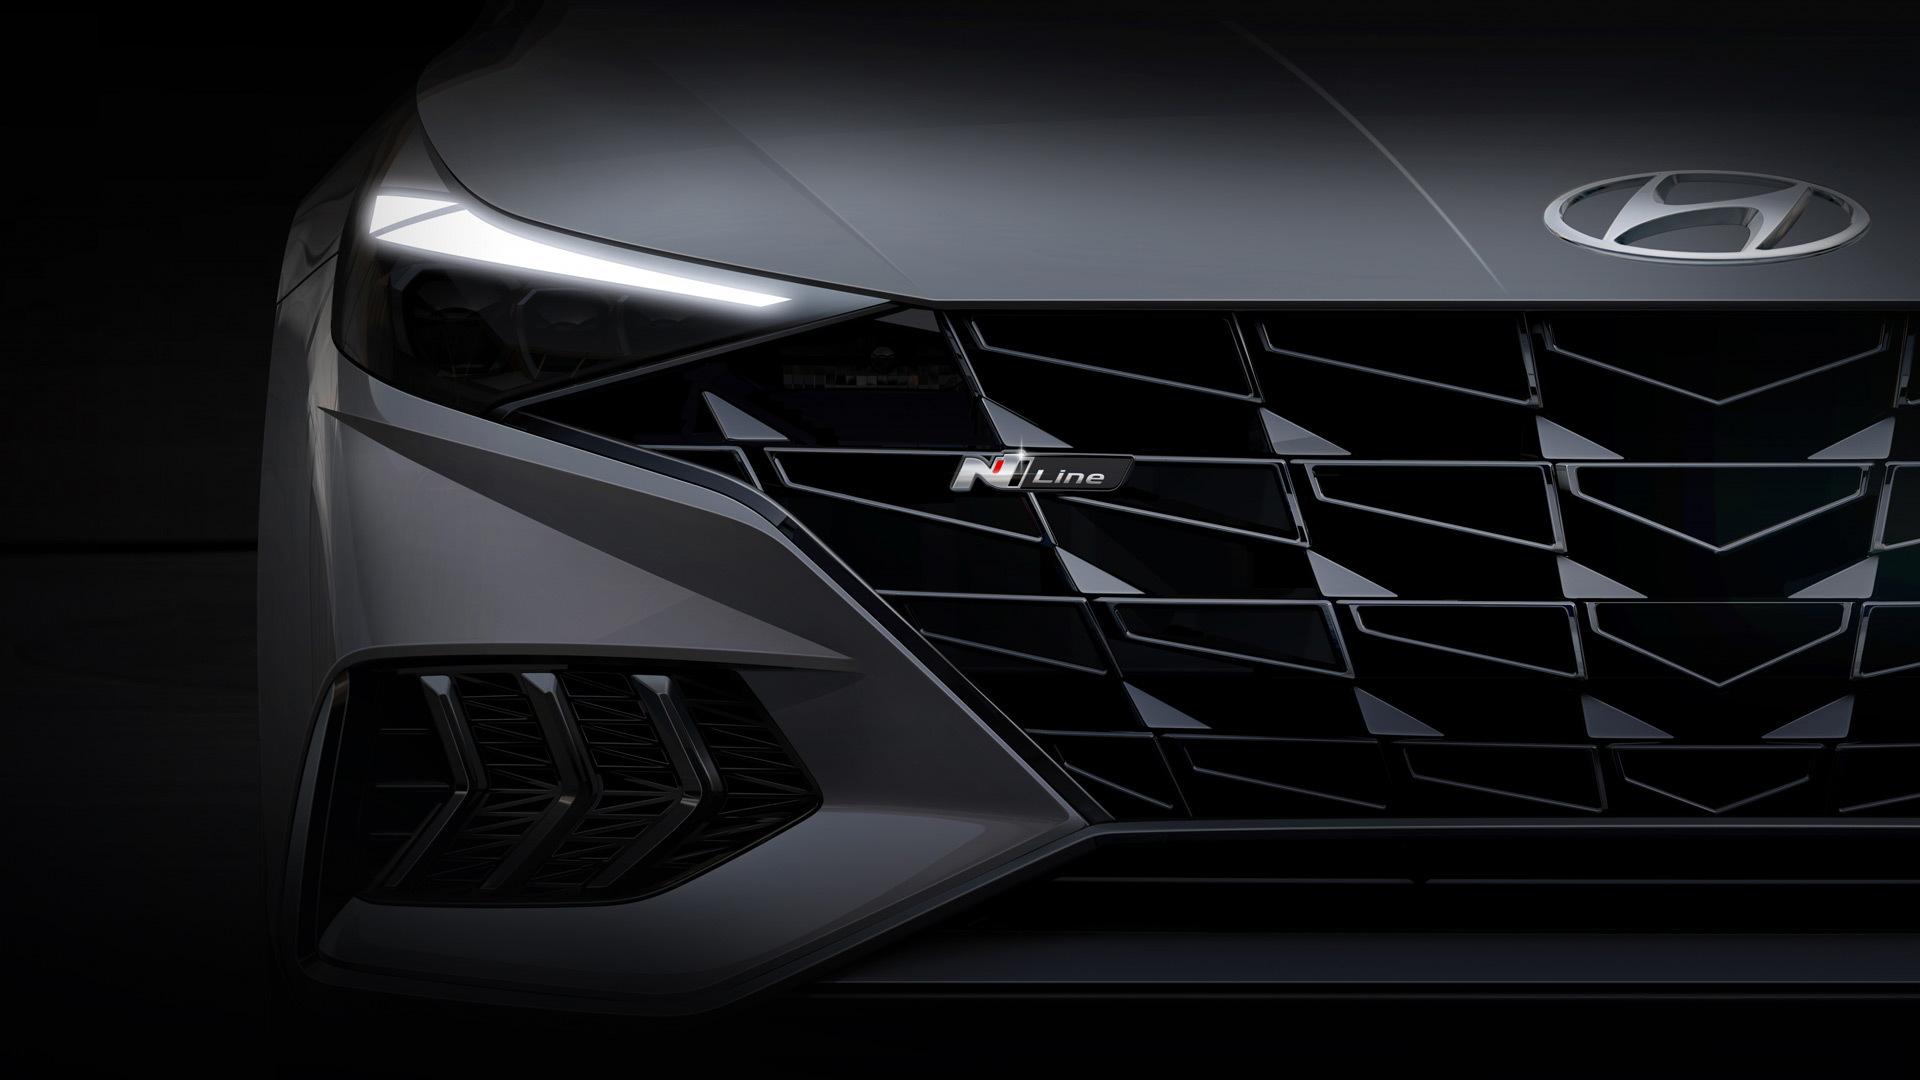 Teaser for 2021 Hyundai Elantra N Line